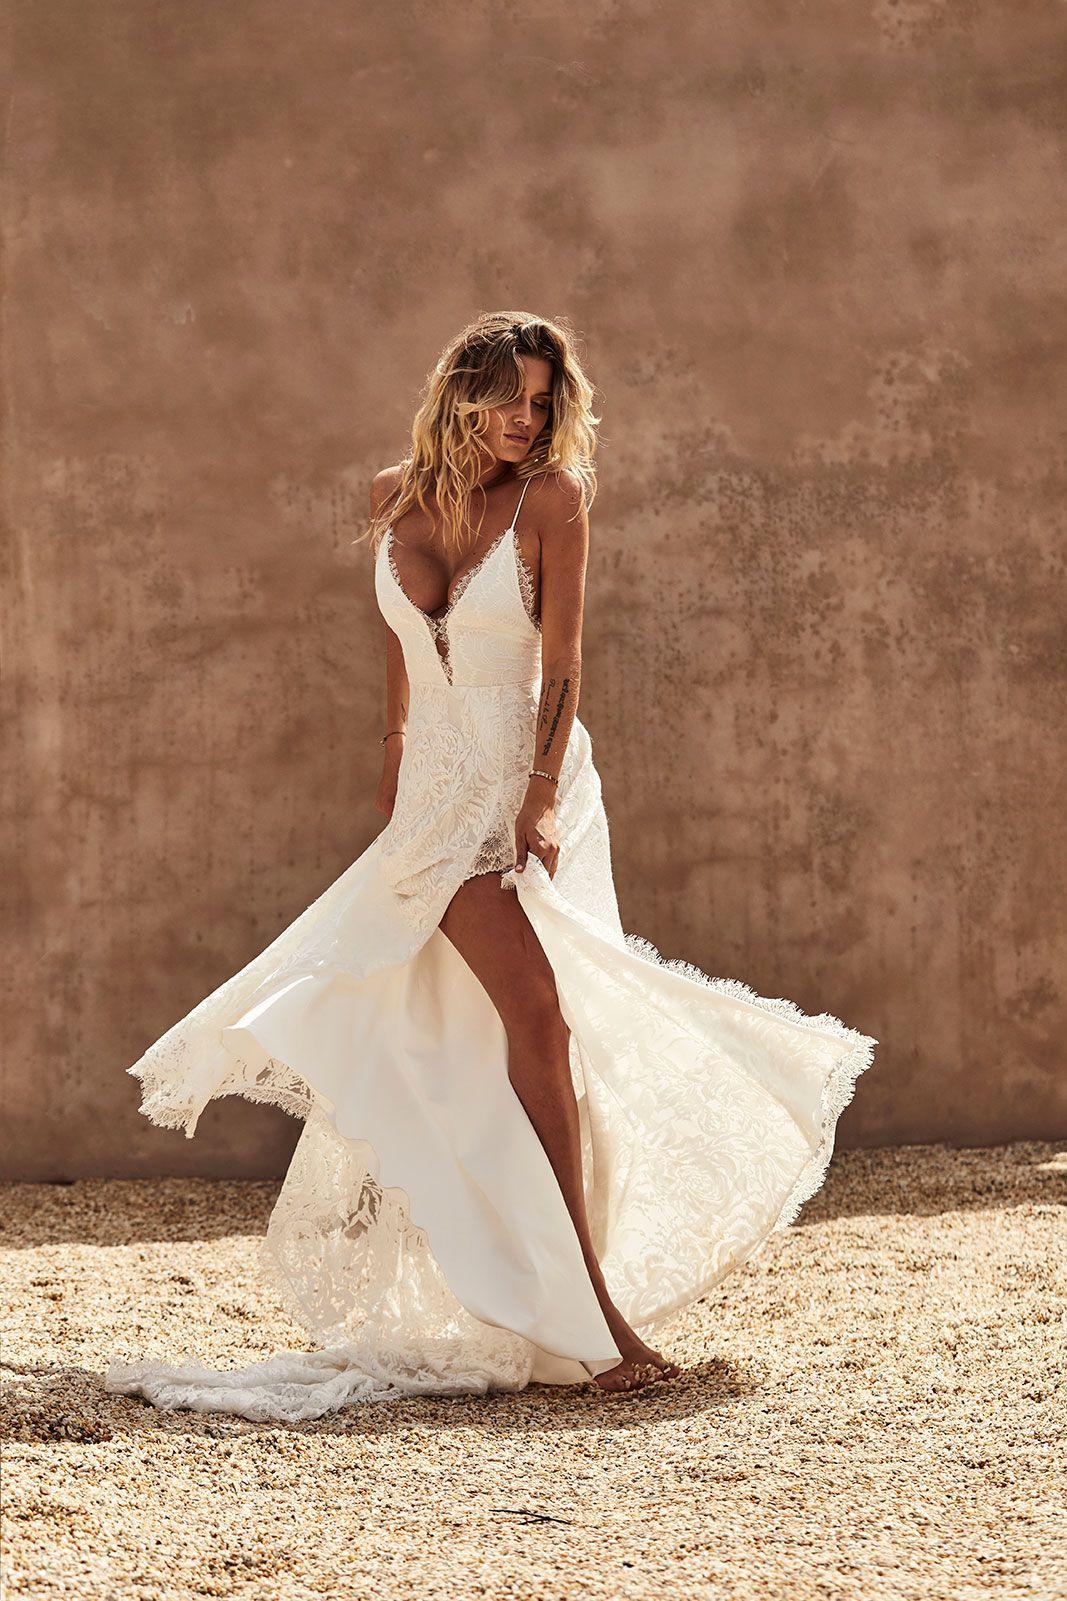 Darling Gown Lace Wedding Dress Grace Loves Lace Australian Wedding Dresses Short Wedding Dress Grace Loves Lace [ 1601 x 1067 Pixel ]